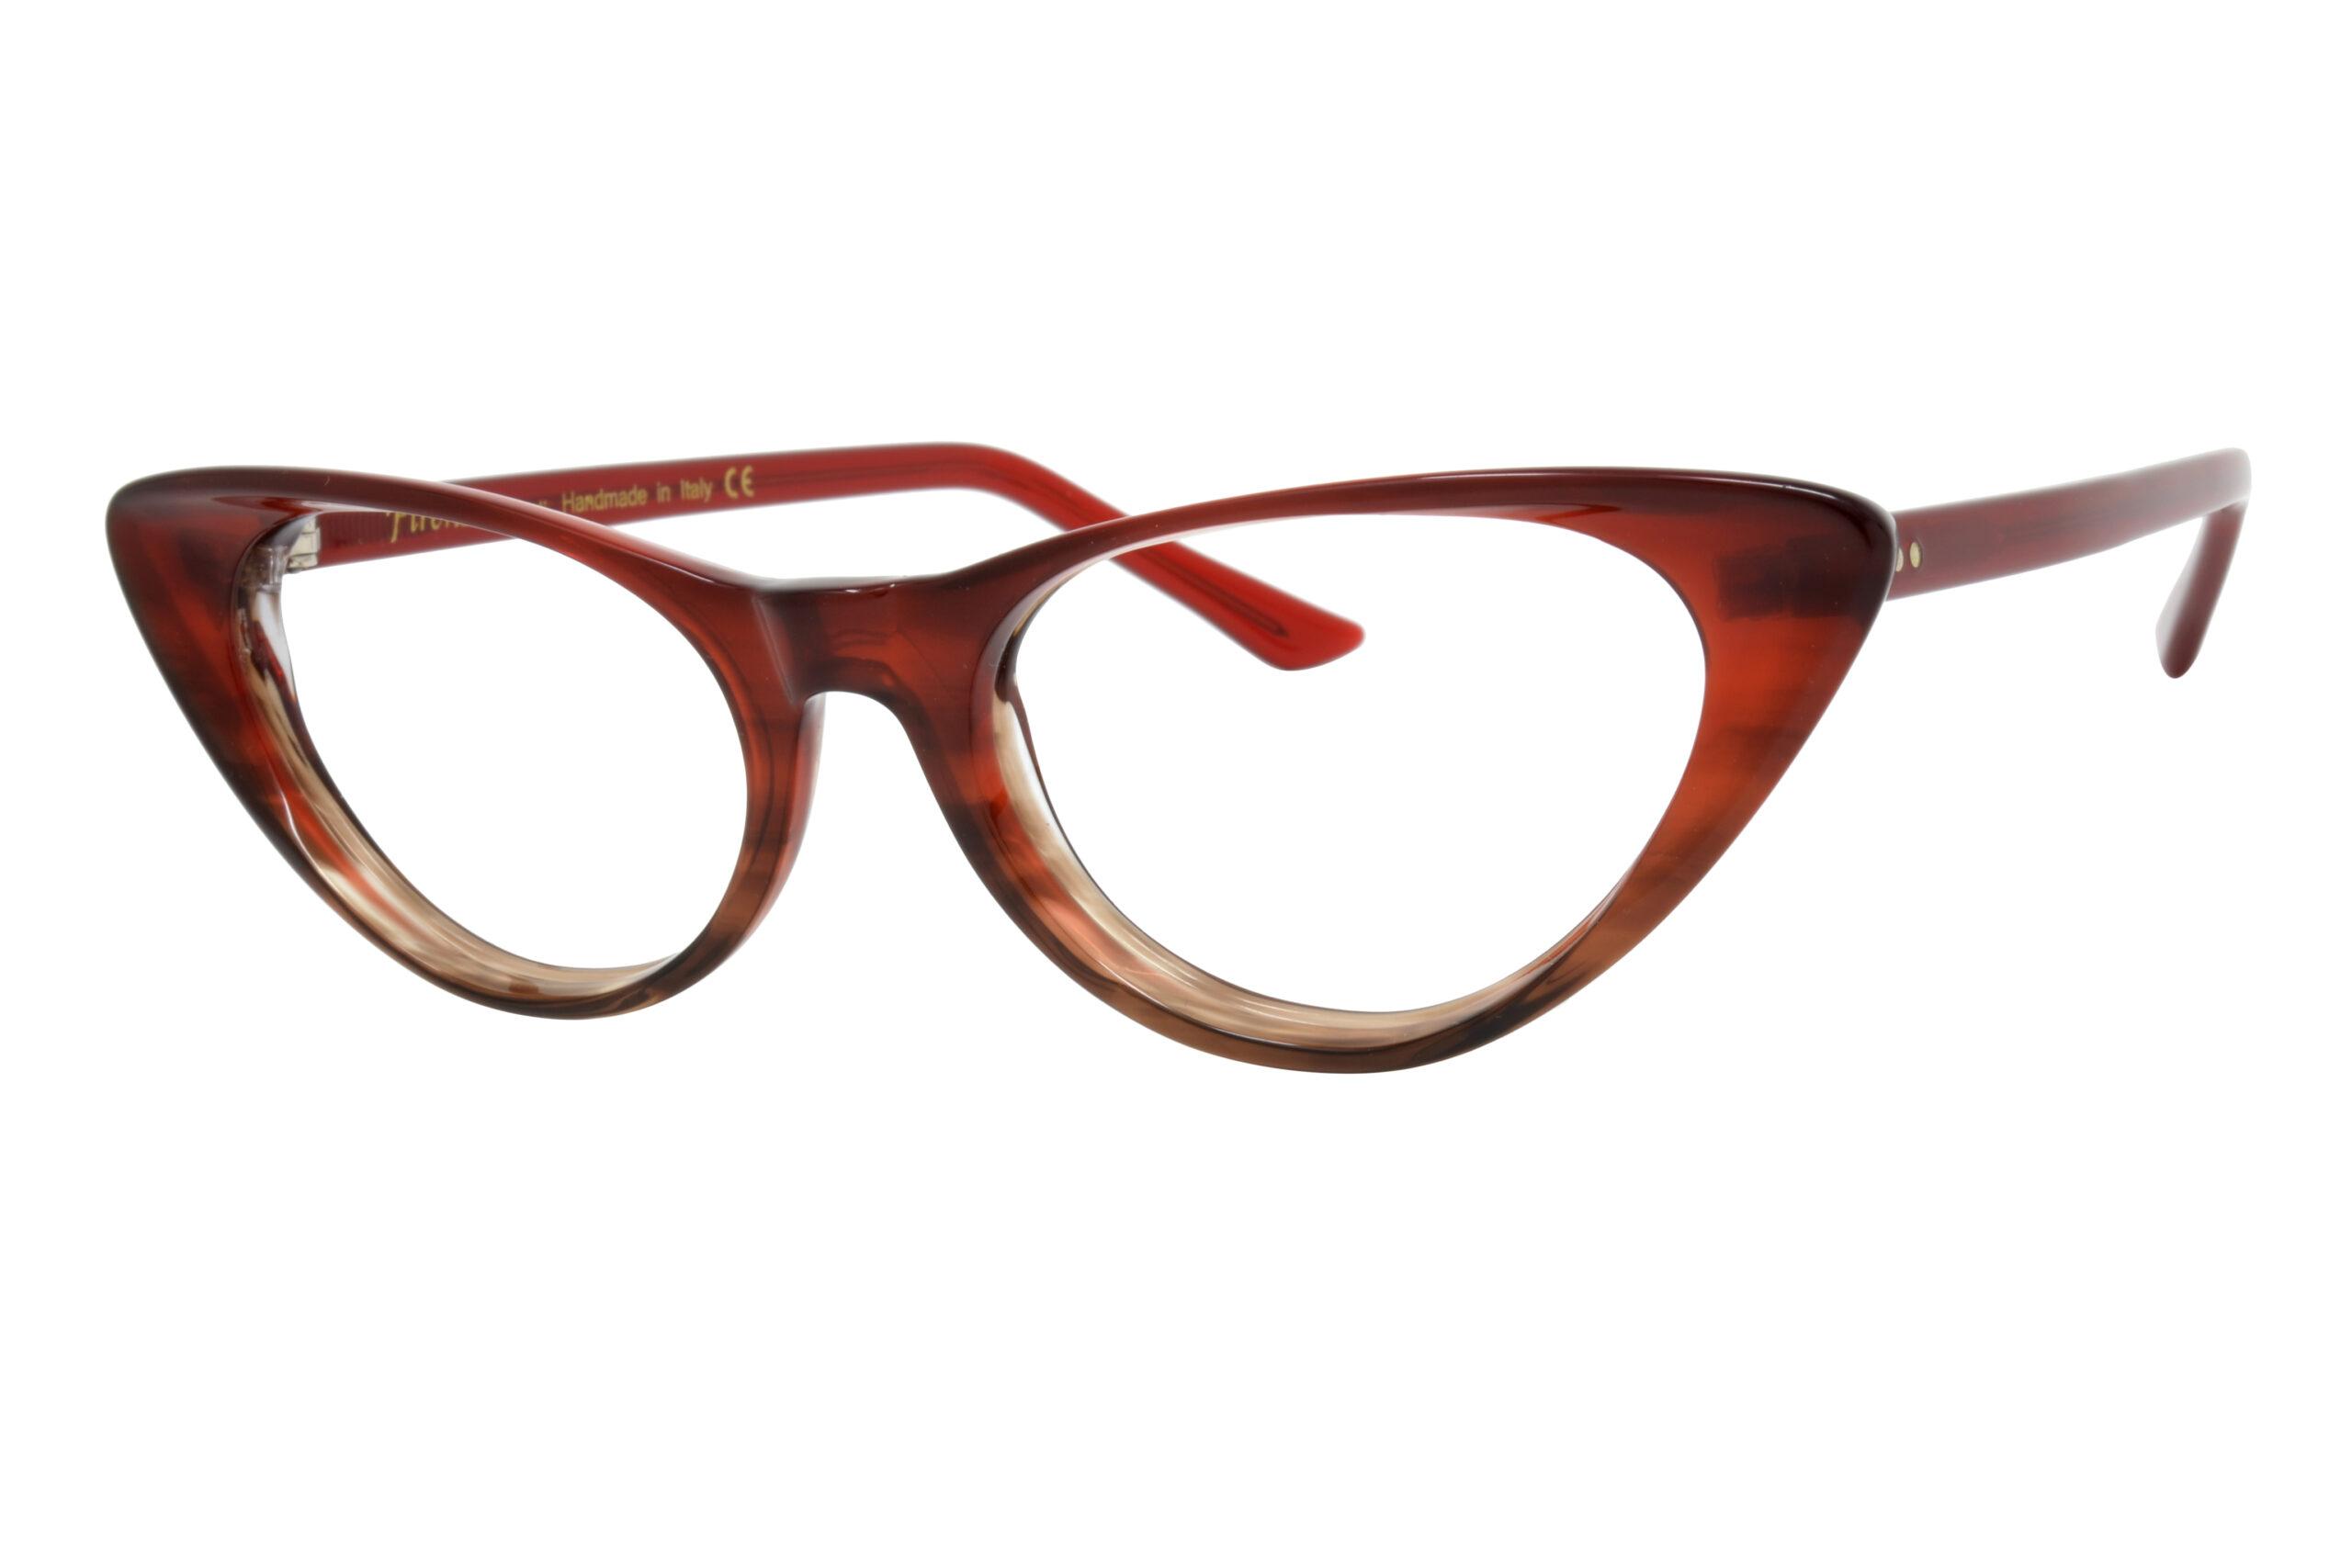 Dolabany Eyewear Firenze Occhiali Volterra Burgundy Brown